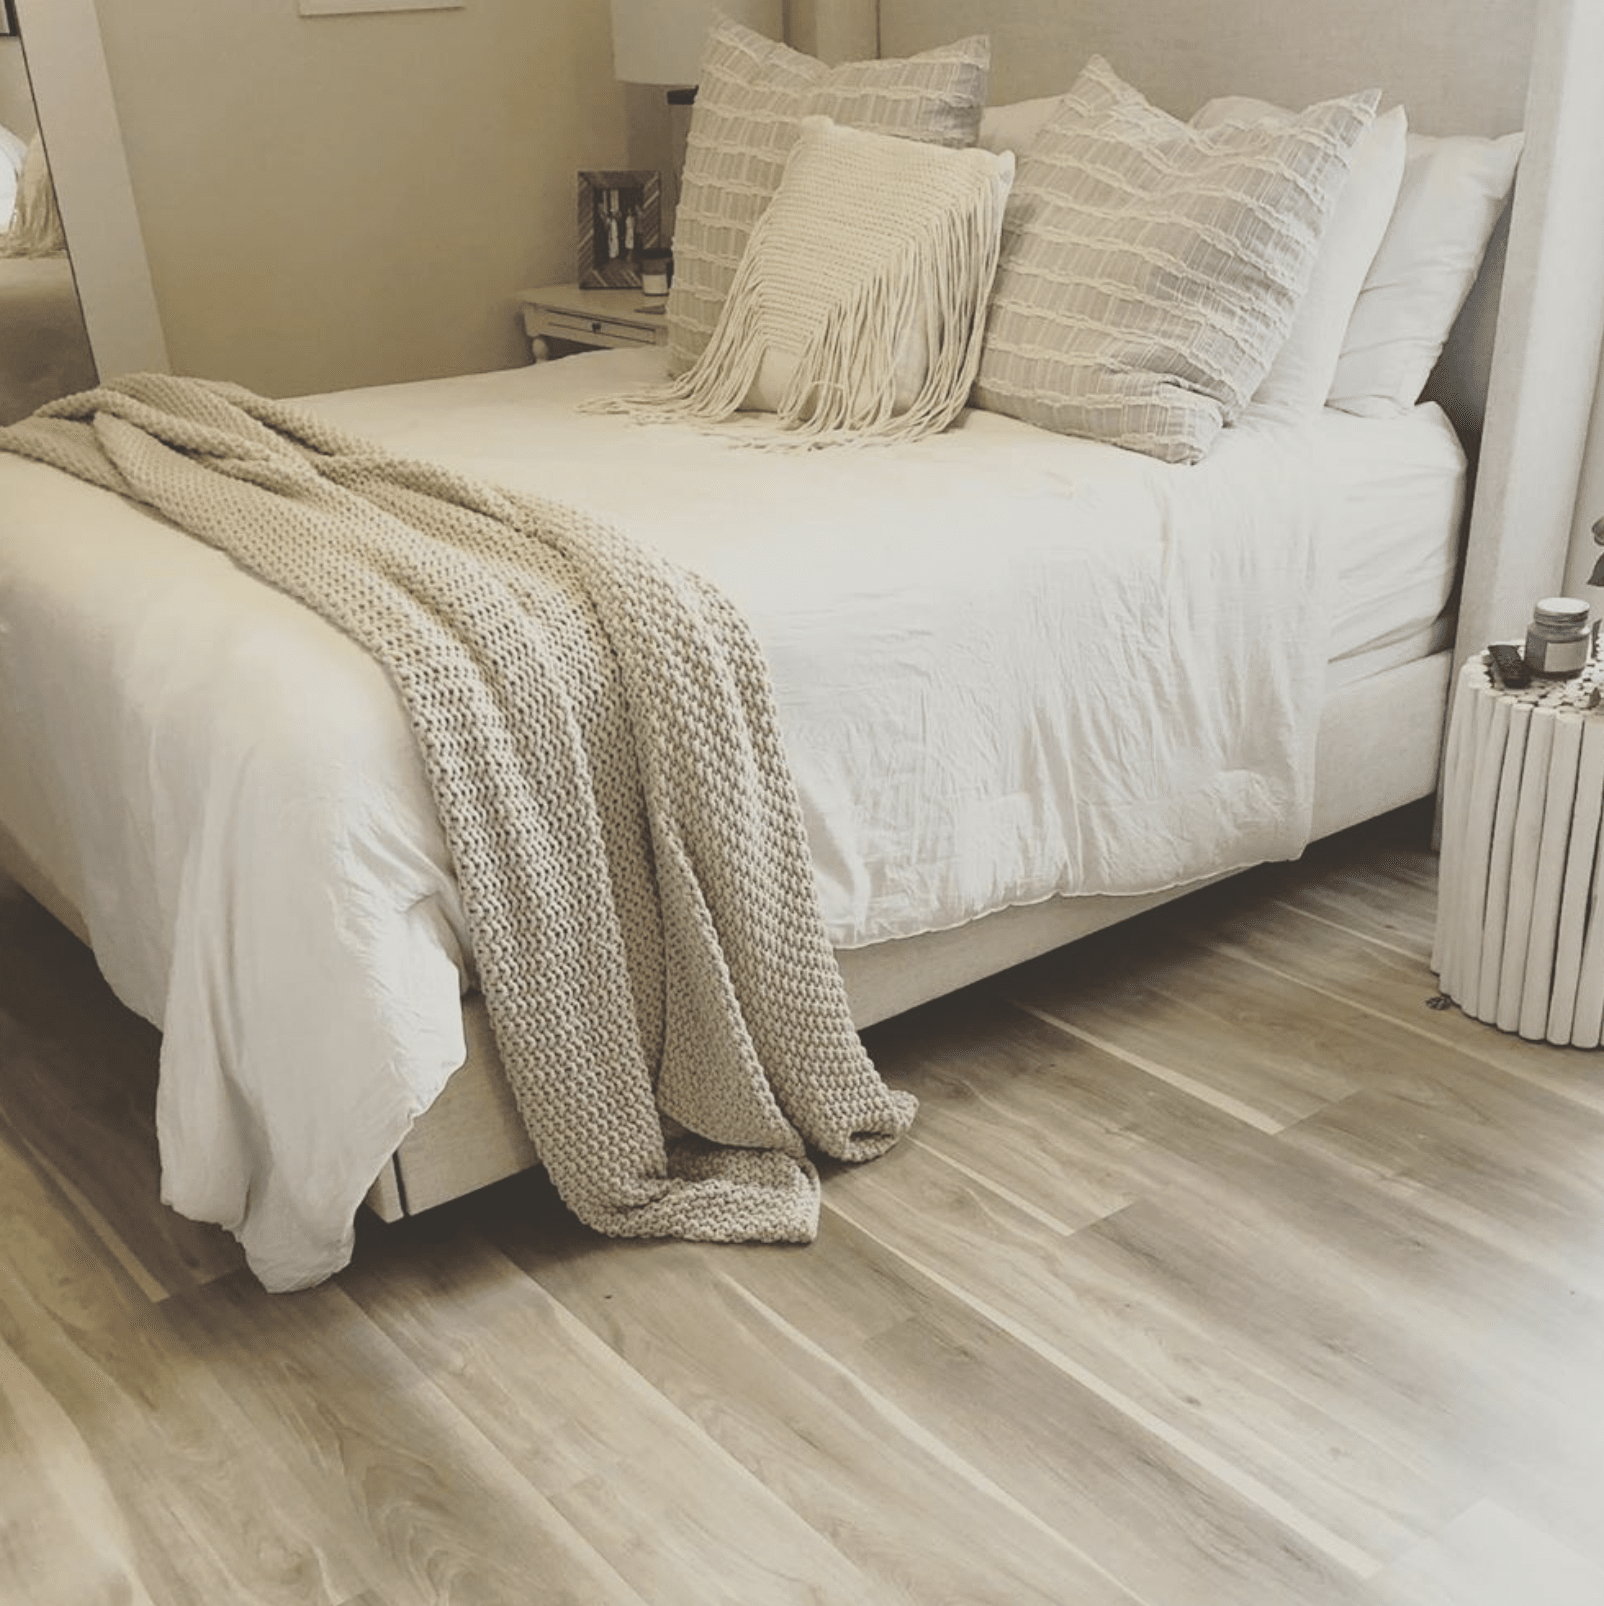 Hardwood flooring in Coral Gables, FL from Global Wood Floors